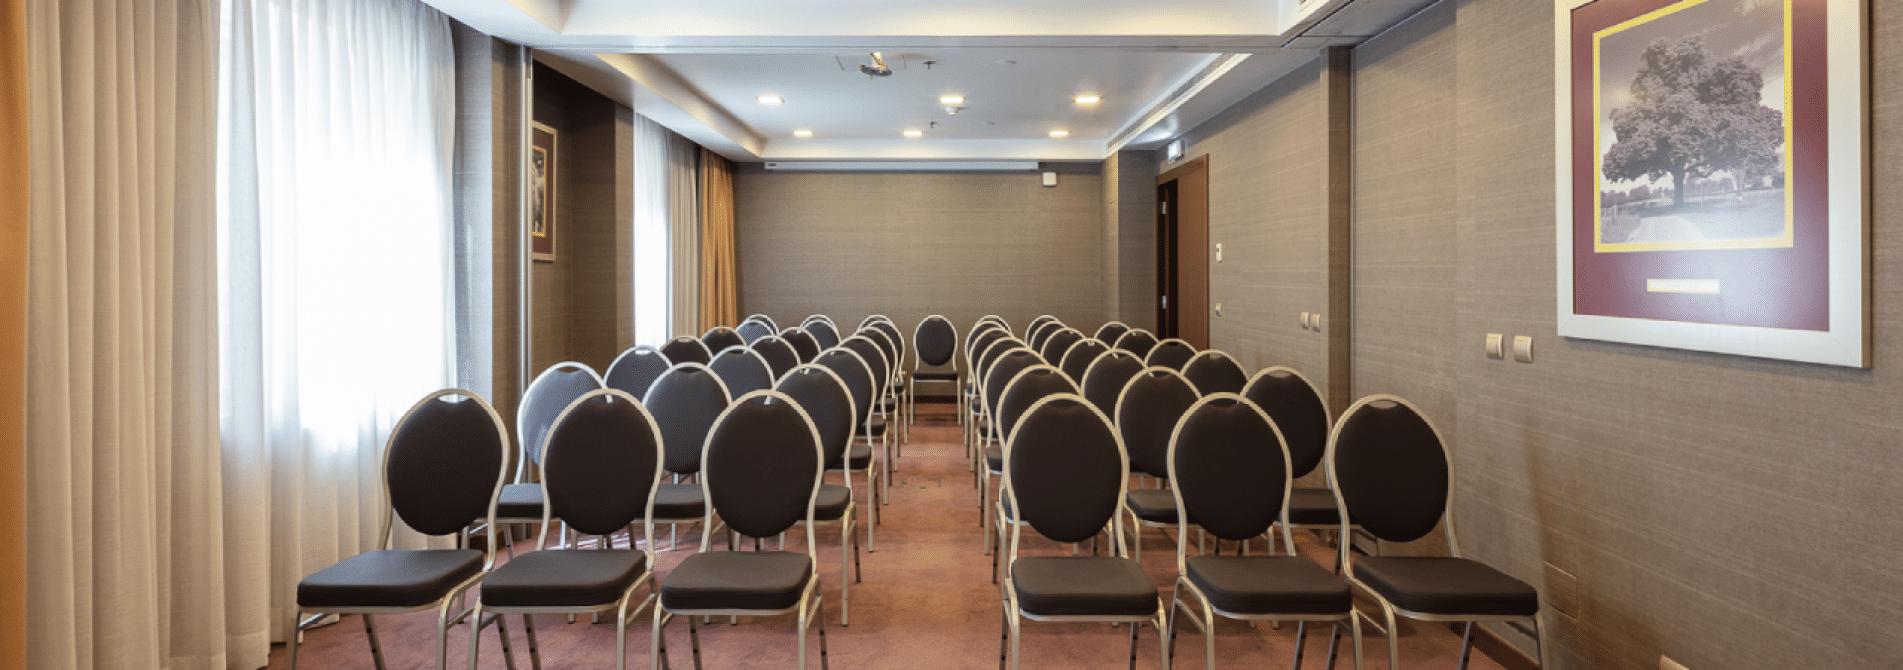 Sala Castanheiro II